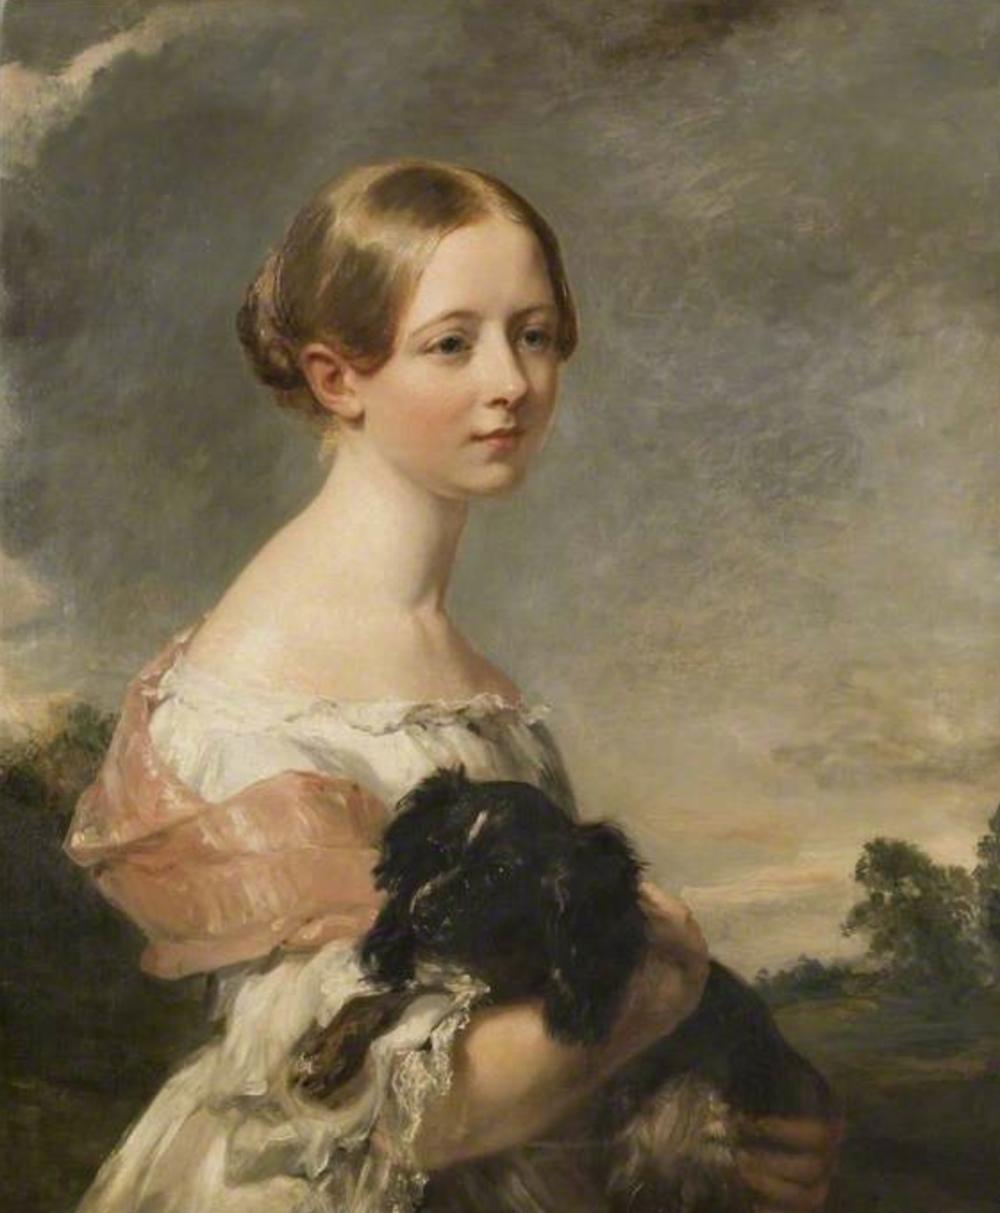 Miss Theobald